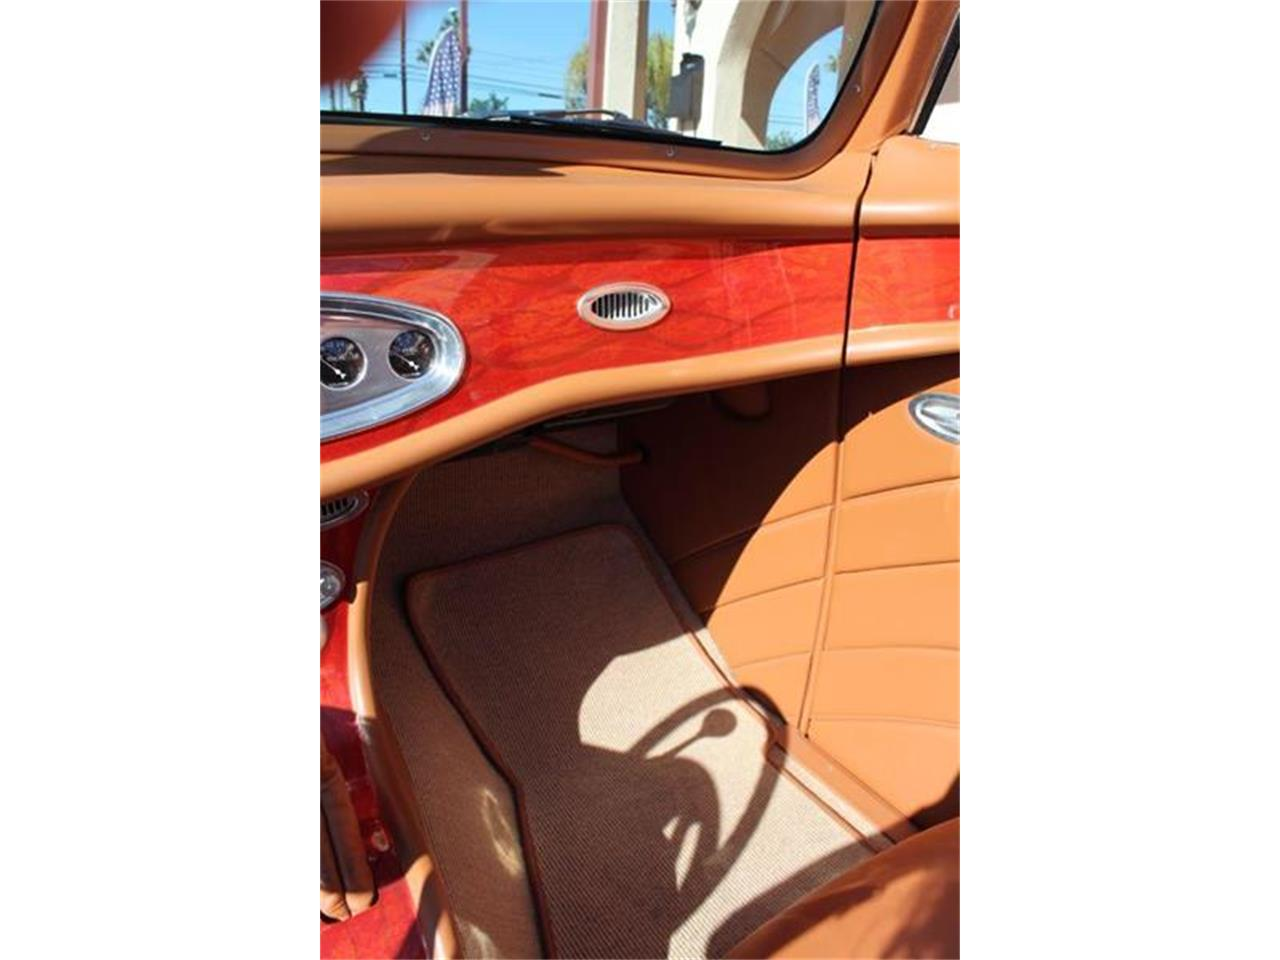 Large Picture of Classic '48 Super Deluxe located in La Verne California - $99,900.00 - 7UHT